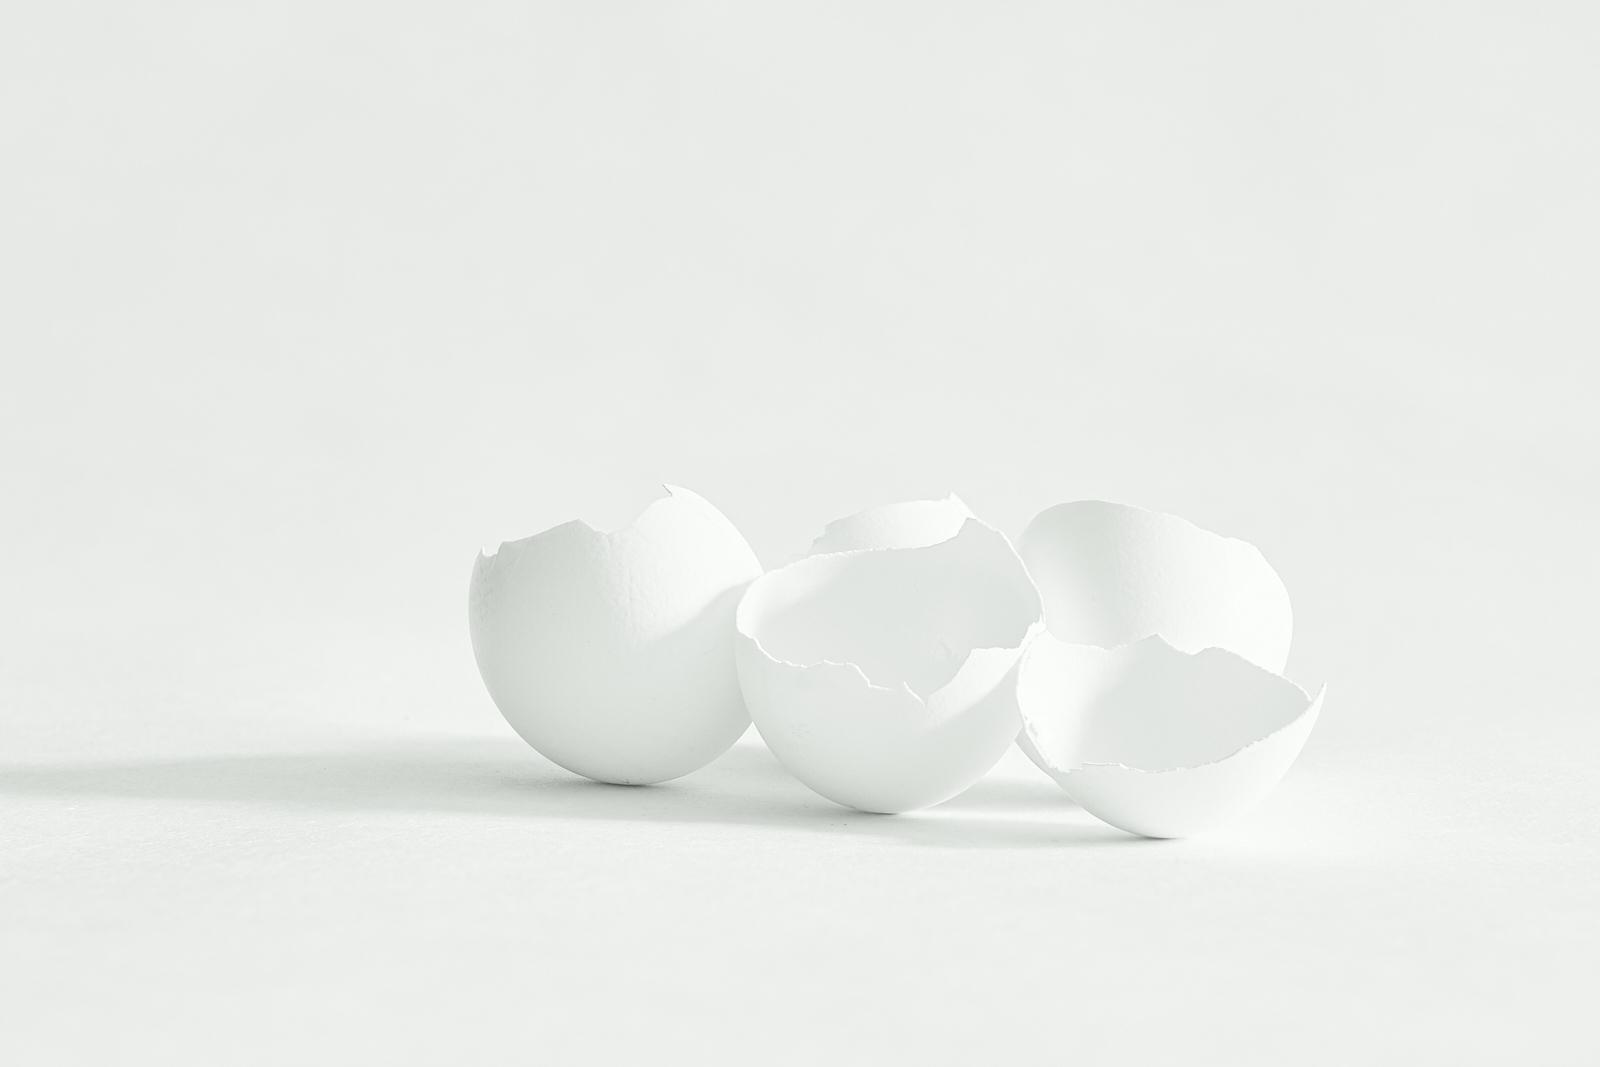 Eggshells-portrait-5